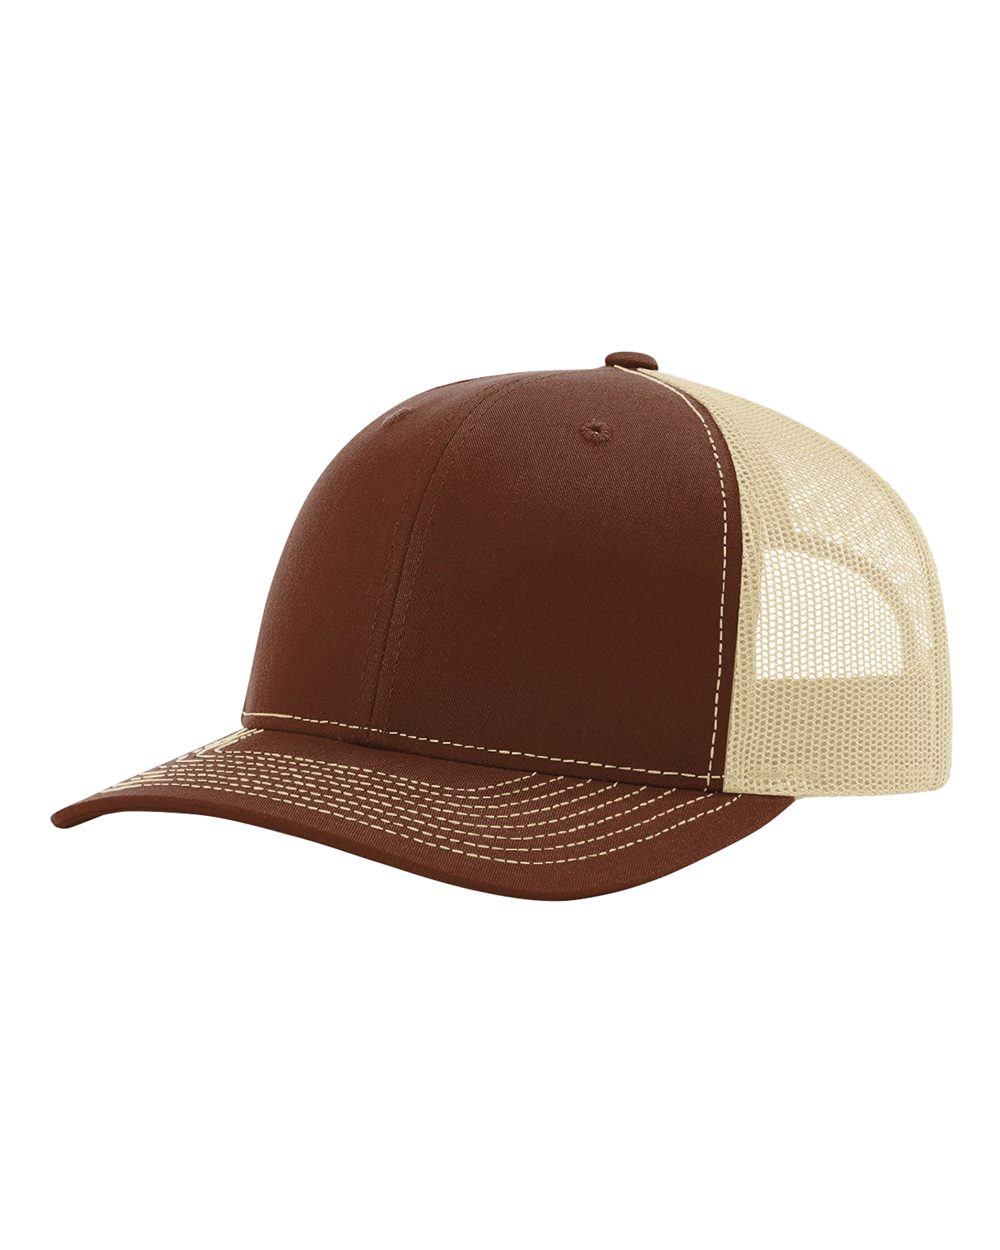 click to view Brown/ Khaki